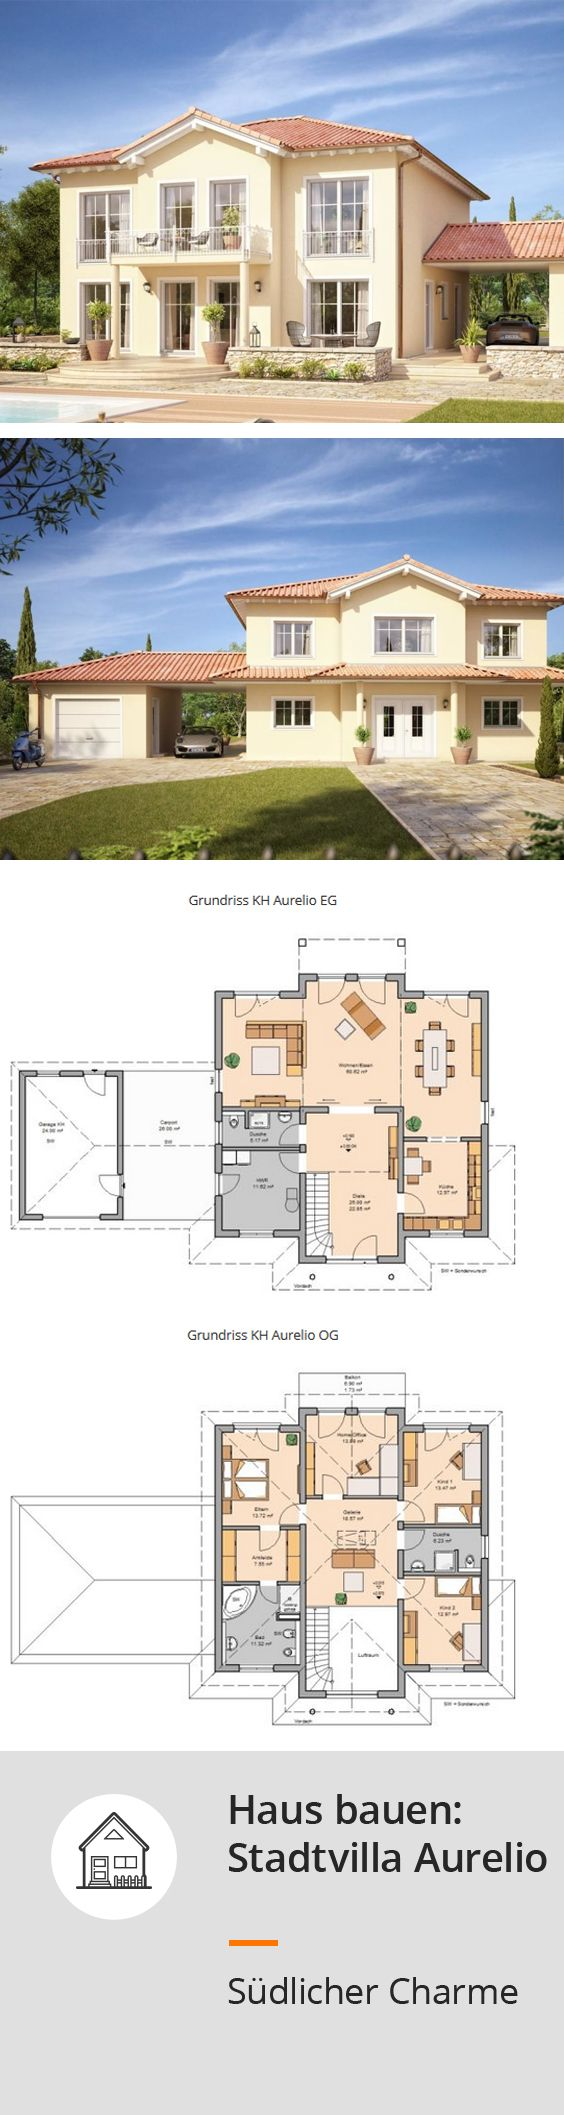 Die #Villa Bringt Mediterranes Flair In Jedes Baugebiet. Großzügigeu2026 | Hausbau  Ideen   Verschiedene Haustypen | Pinteu2026